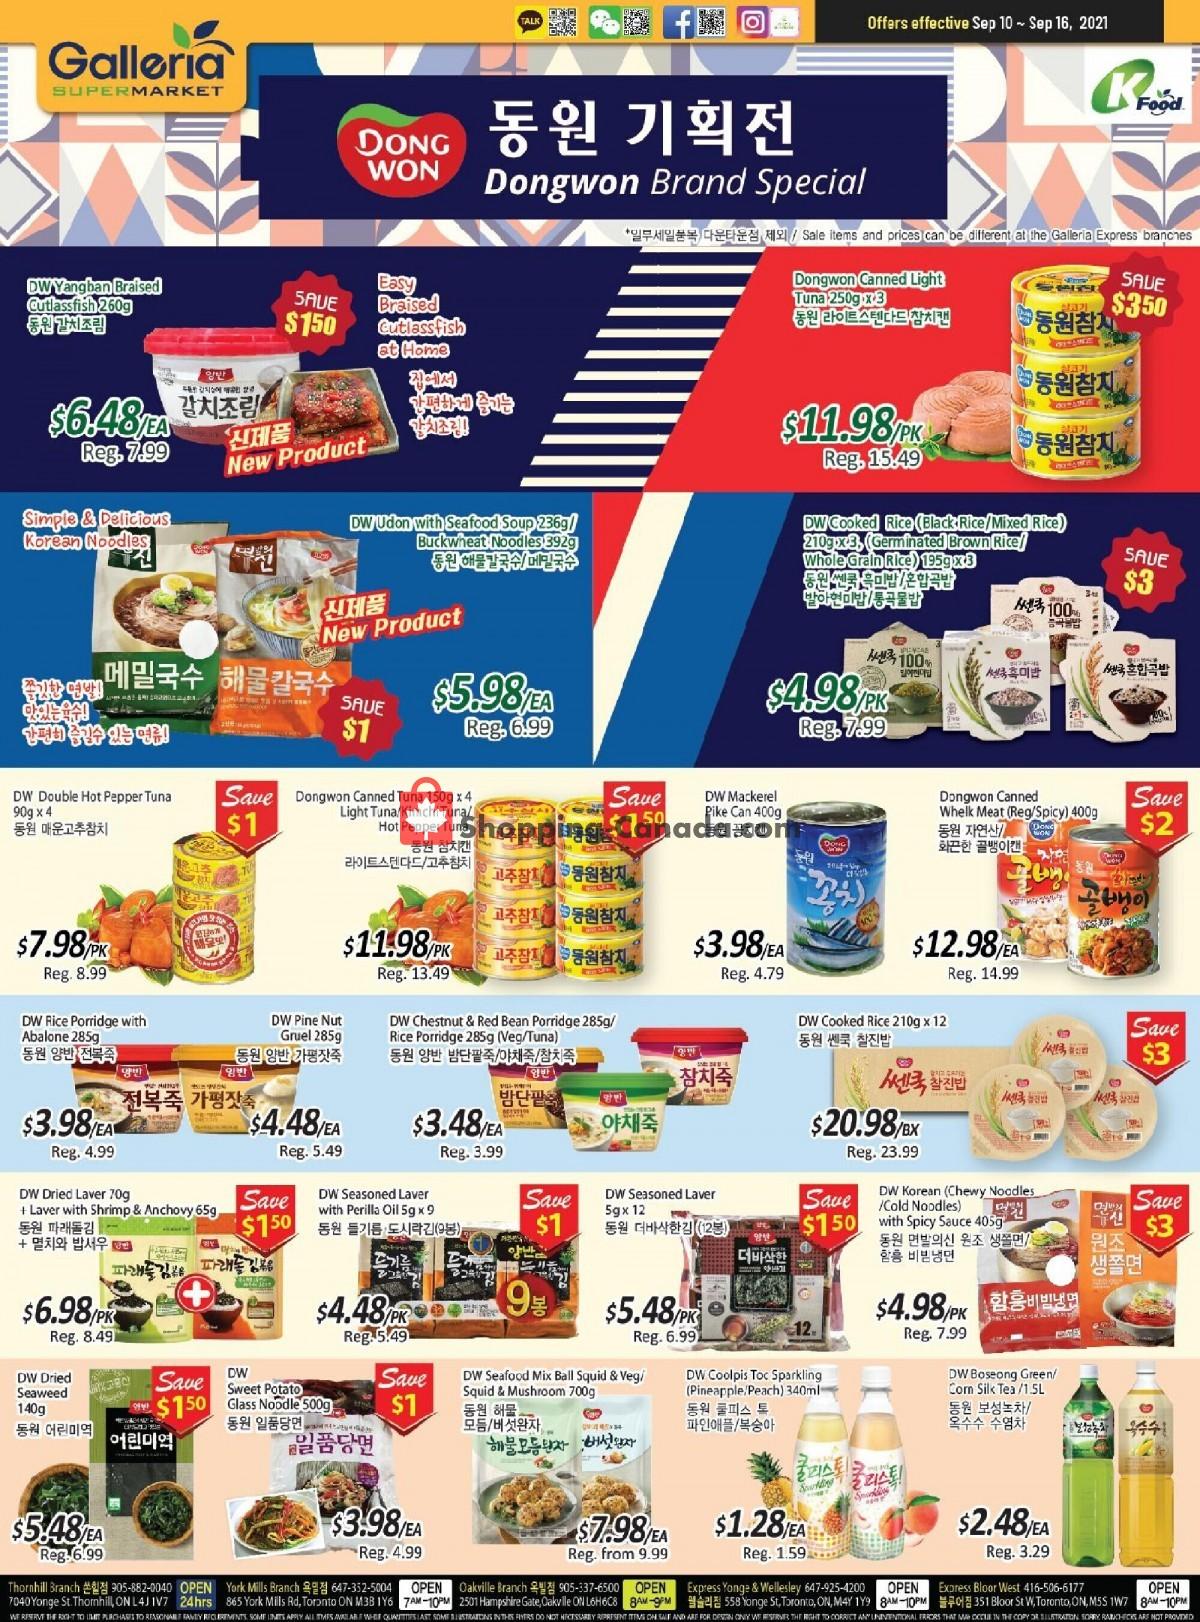 Flyer Galleria Supermarket Canada - from Friday September 10, 2021 to Thursday September 16, 2021